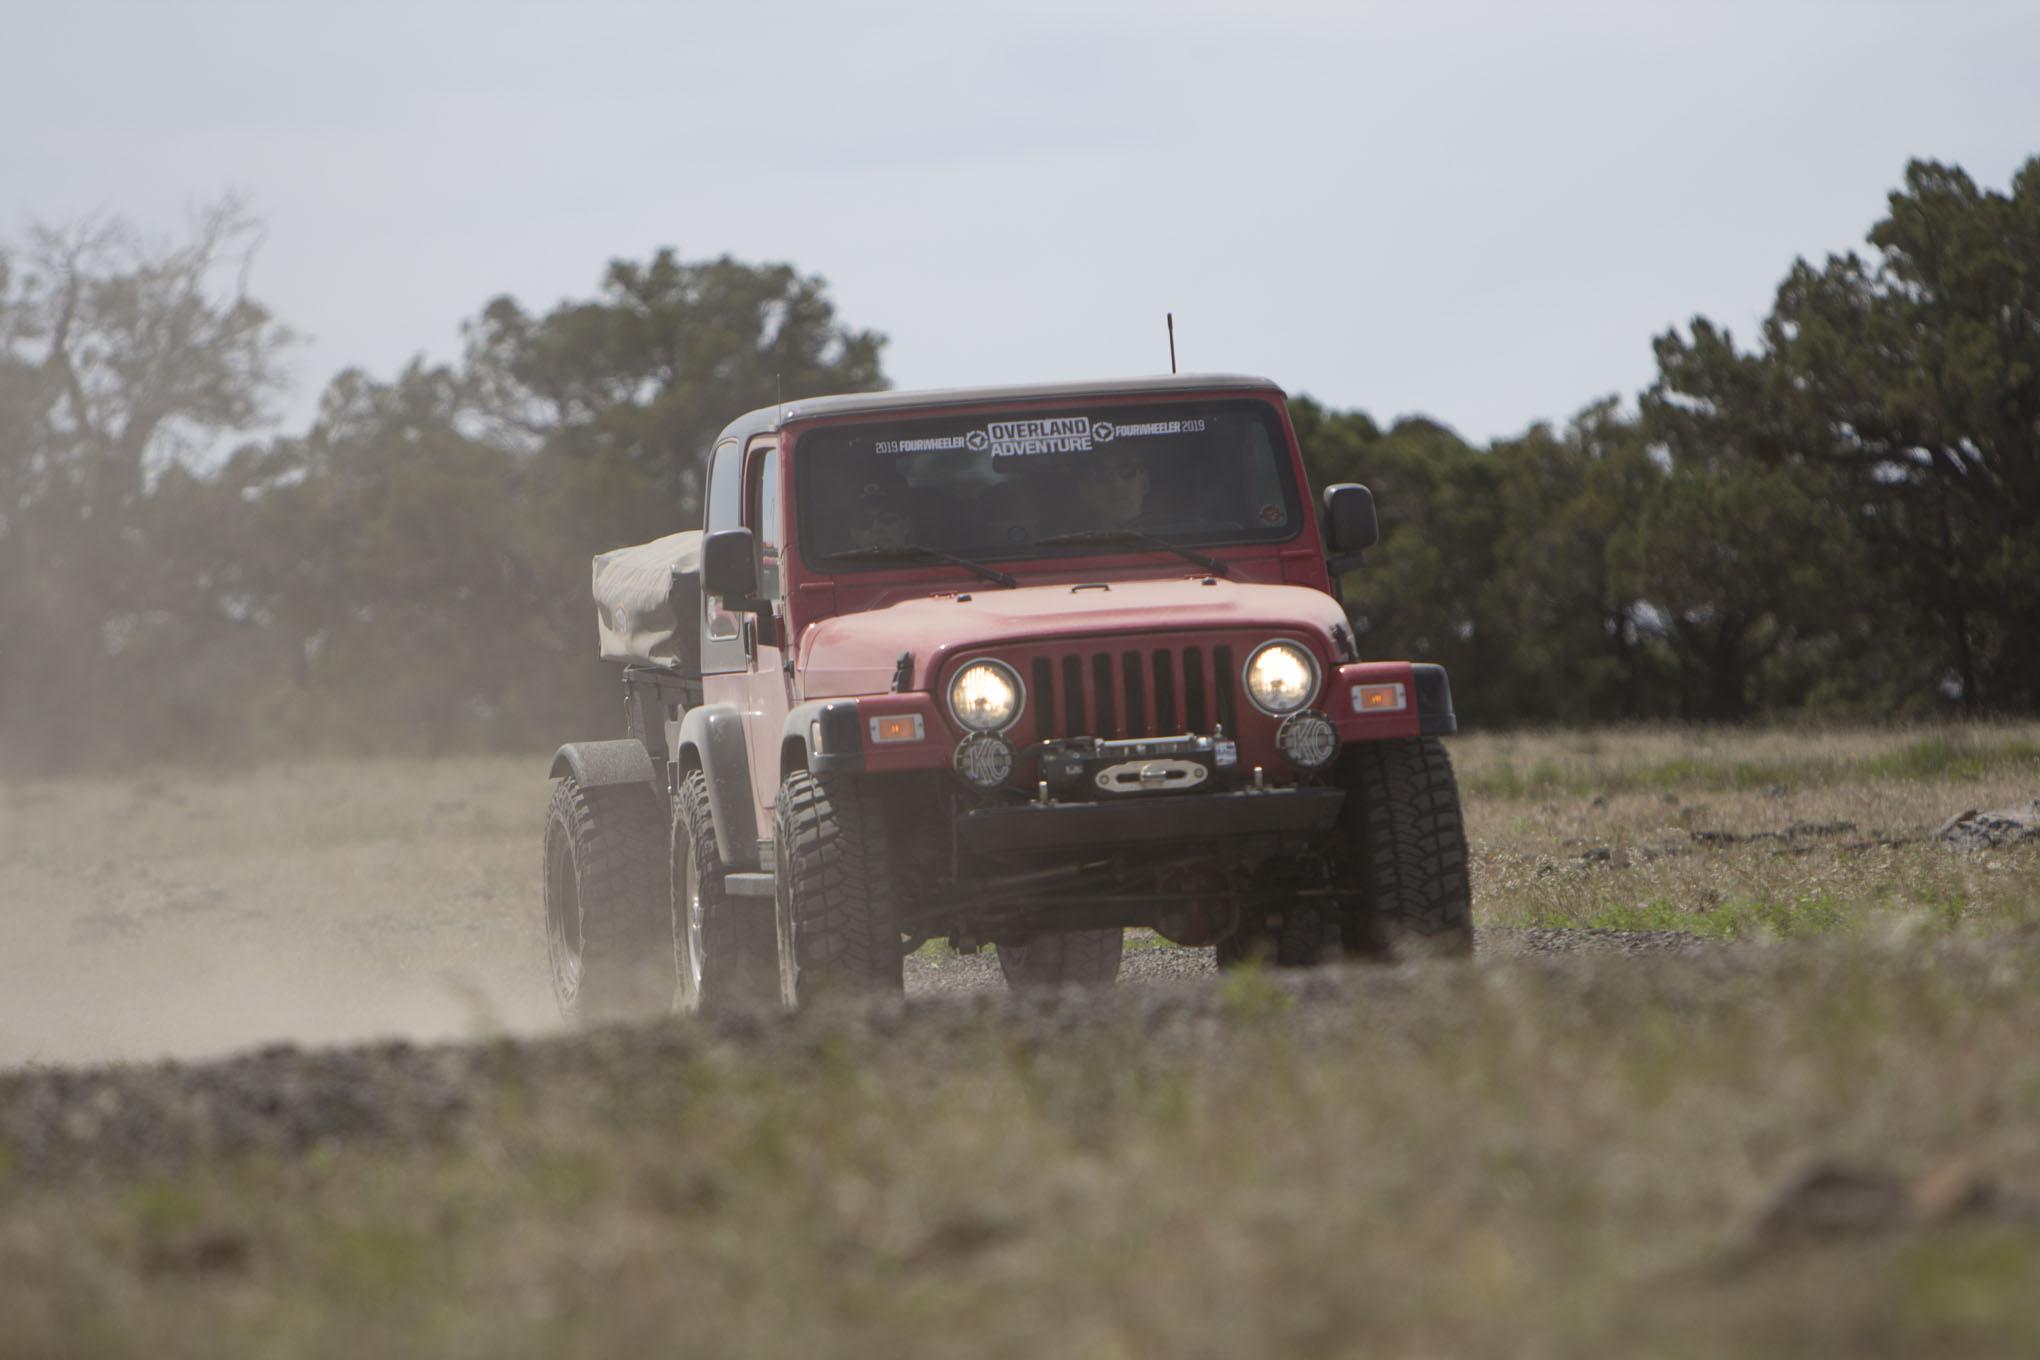 023 four wheeler aaron meyer 2006 jeep wrangler